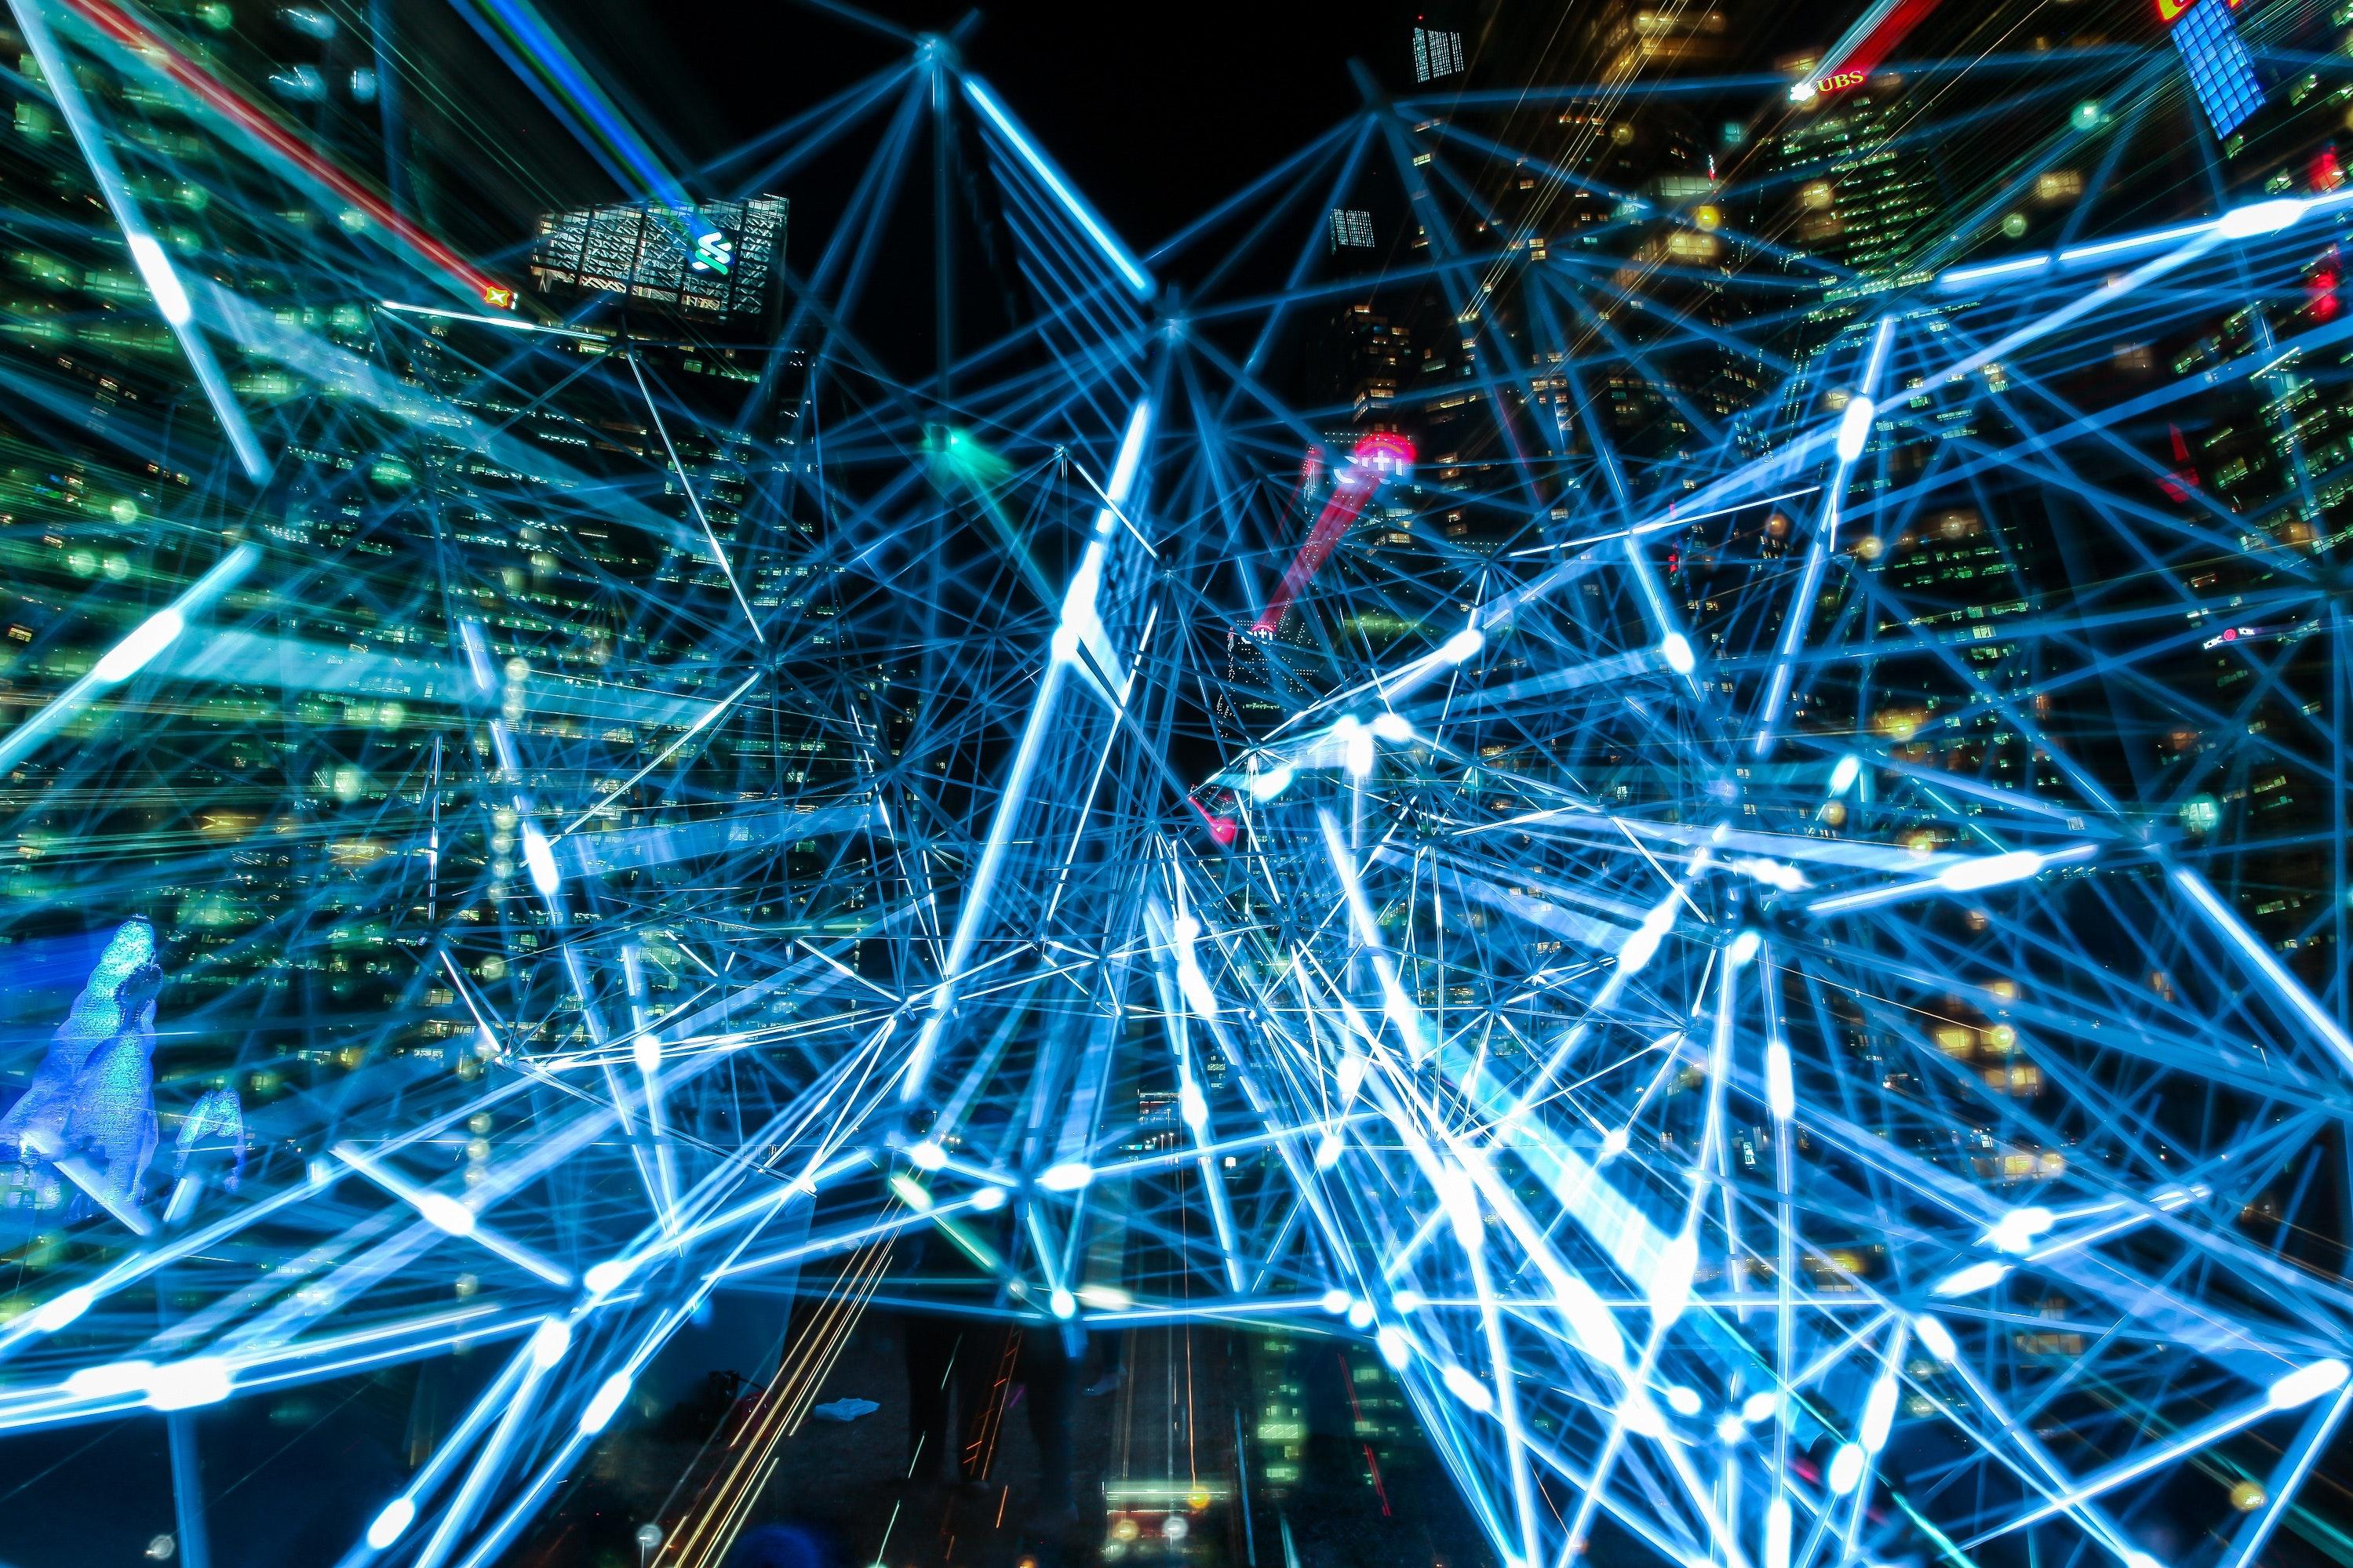 art-big-data-blur-network